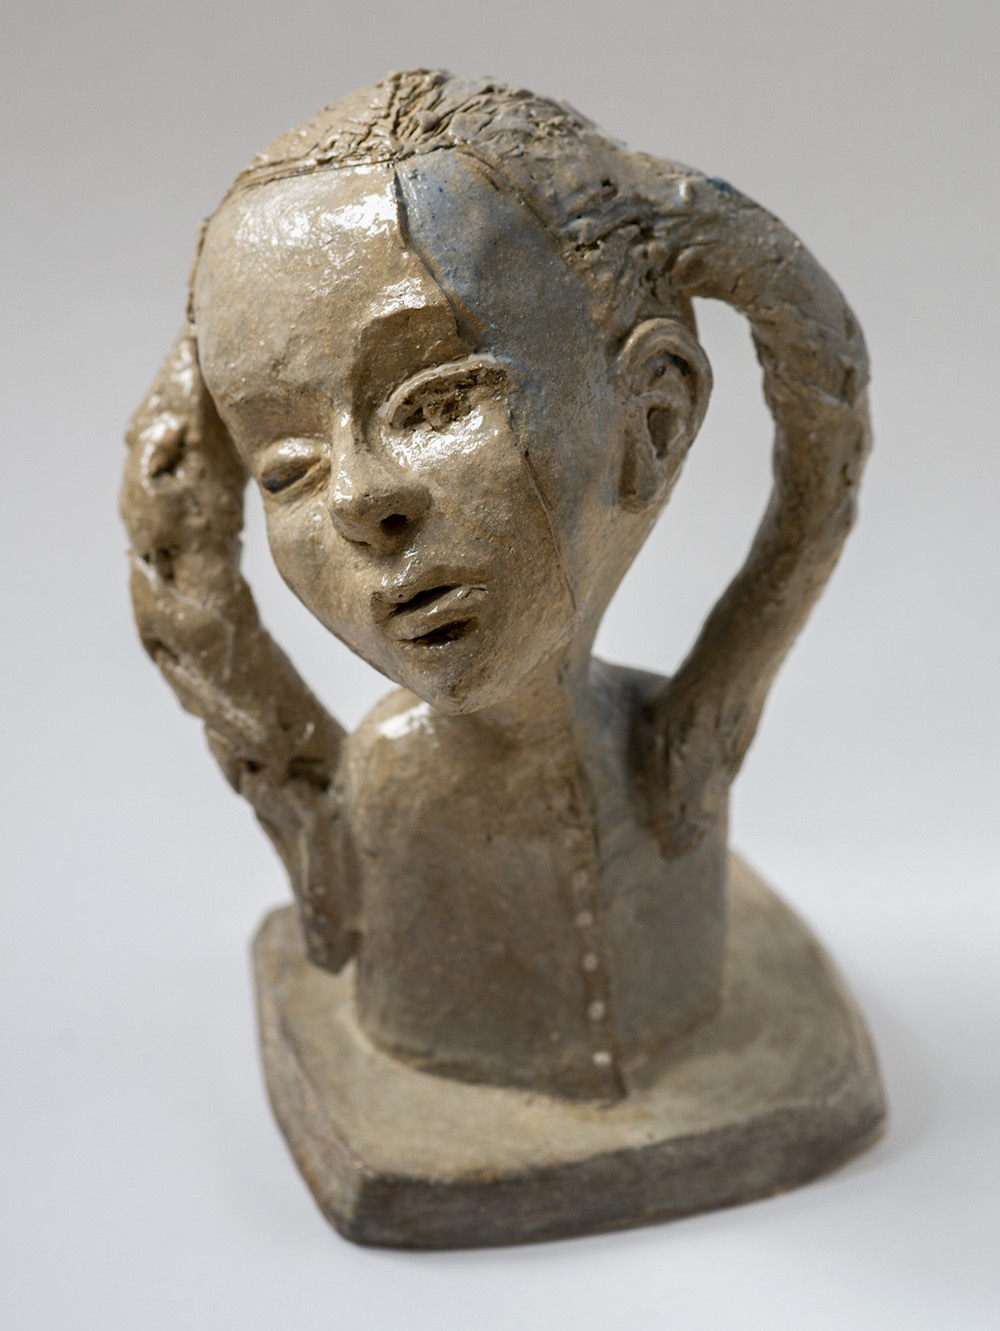 Cecilia Rosenlund Skulptur |Stengods, fylelera H25 x B17 x D15 cm 2 100 kr scillaform.se